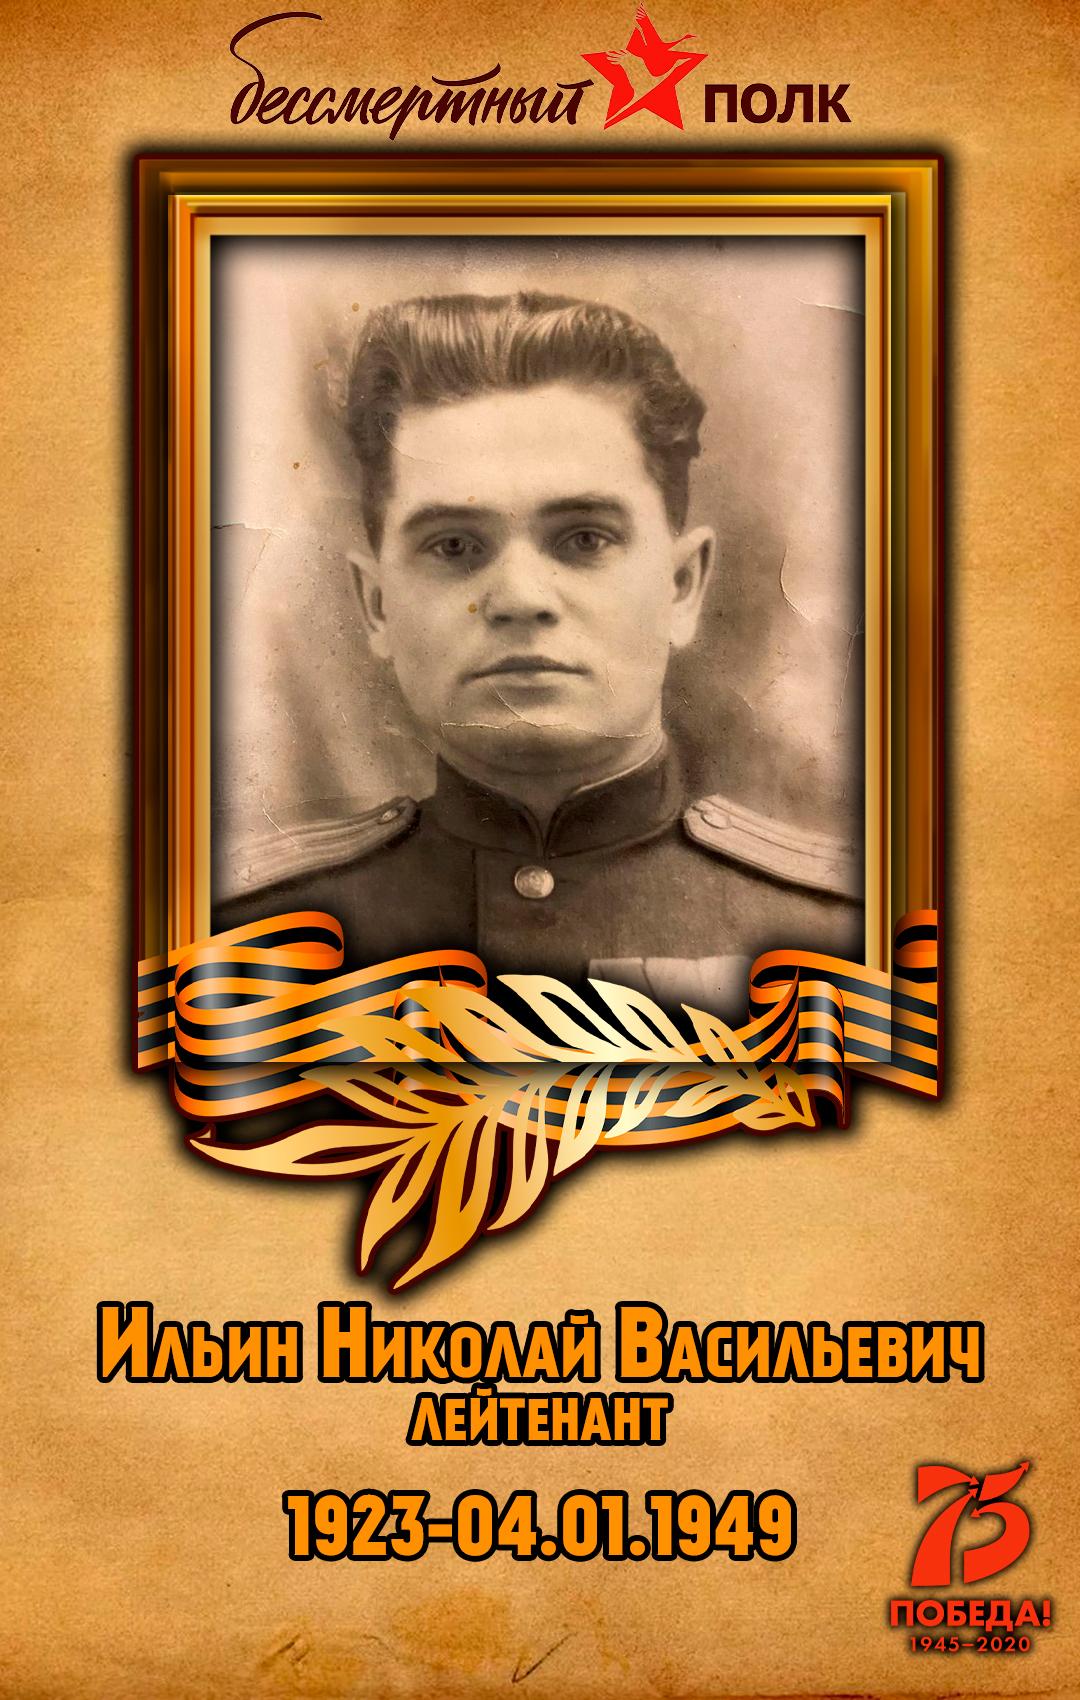 Ильин-Николай-Васильевич